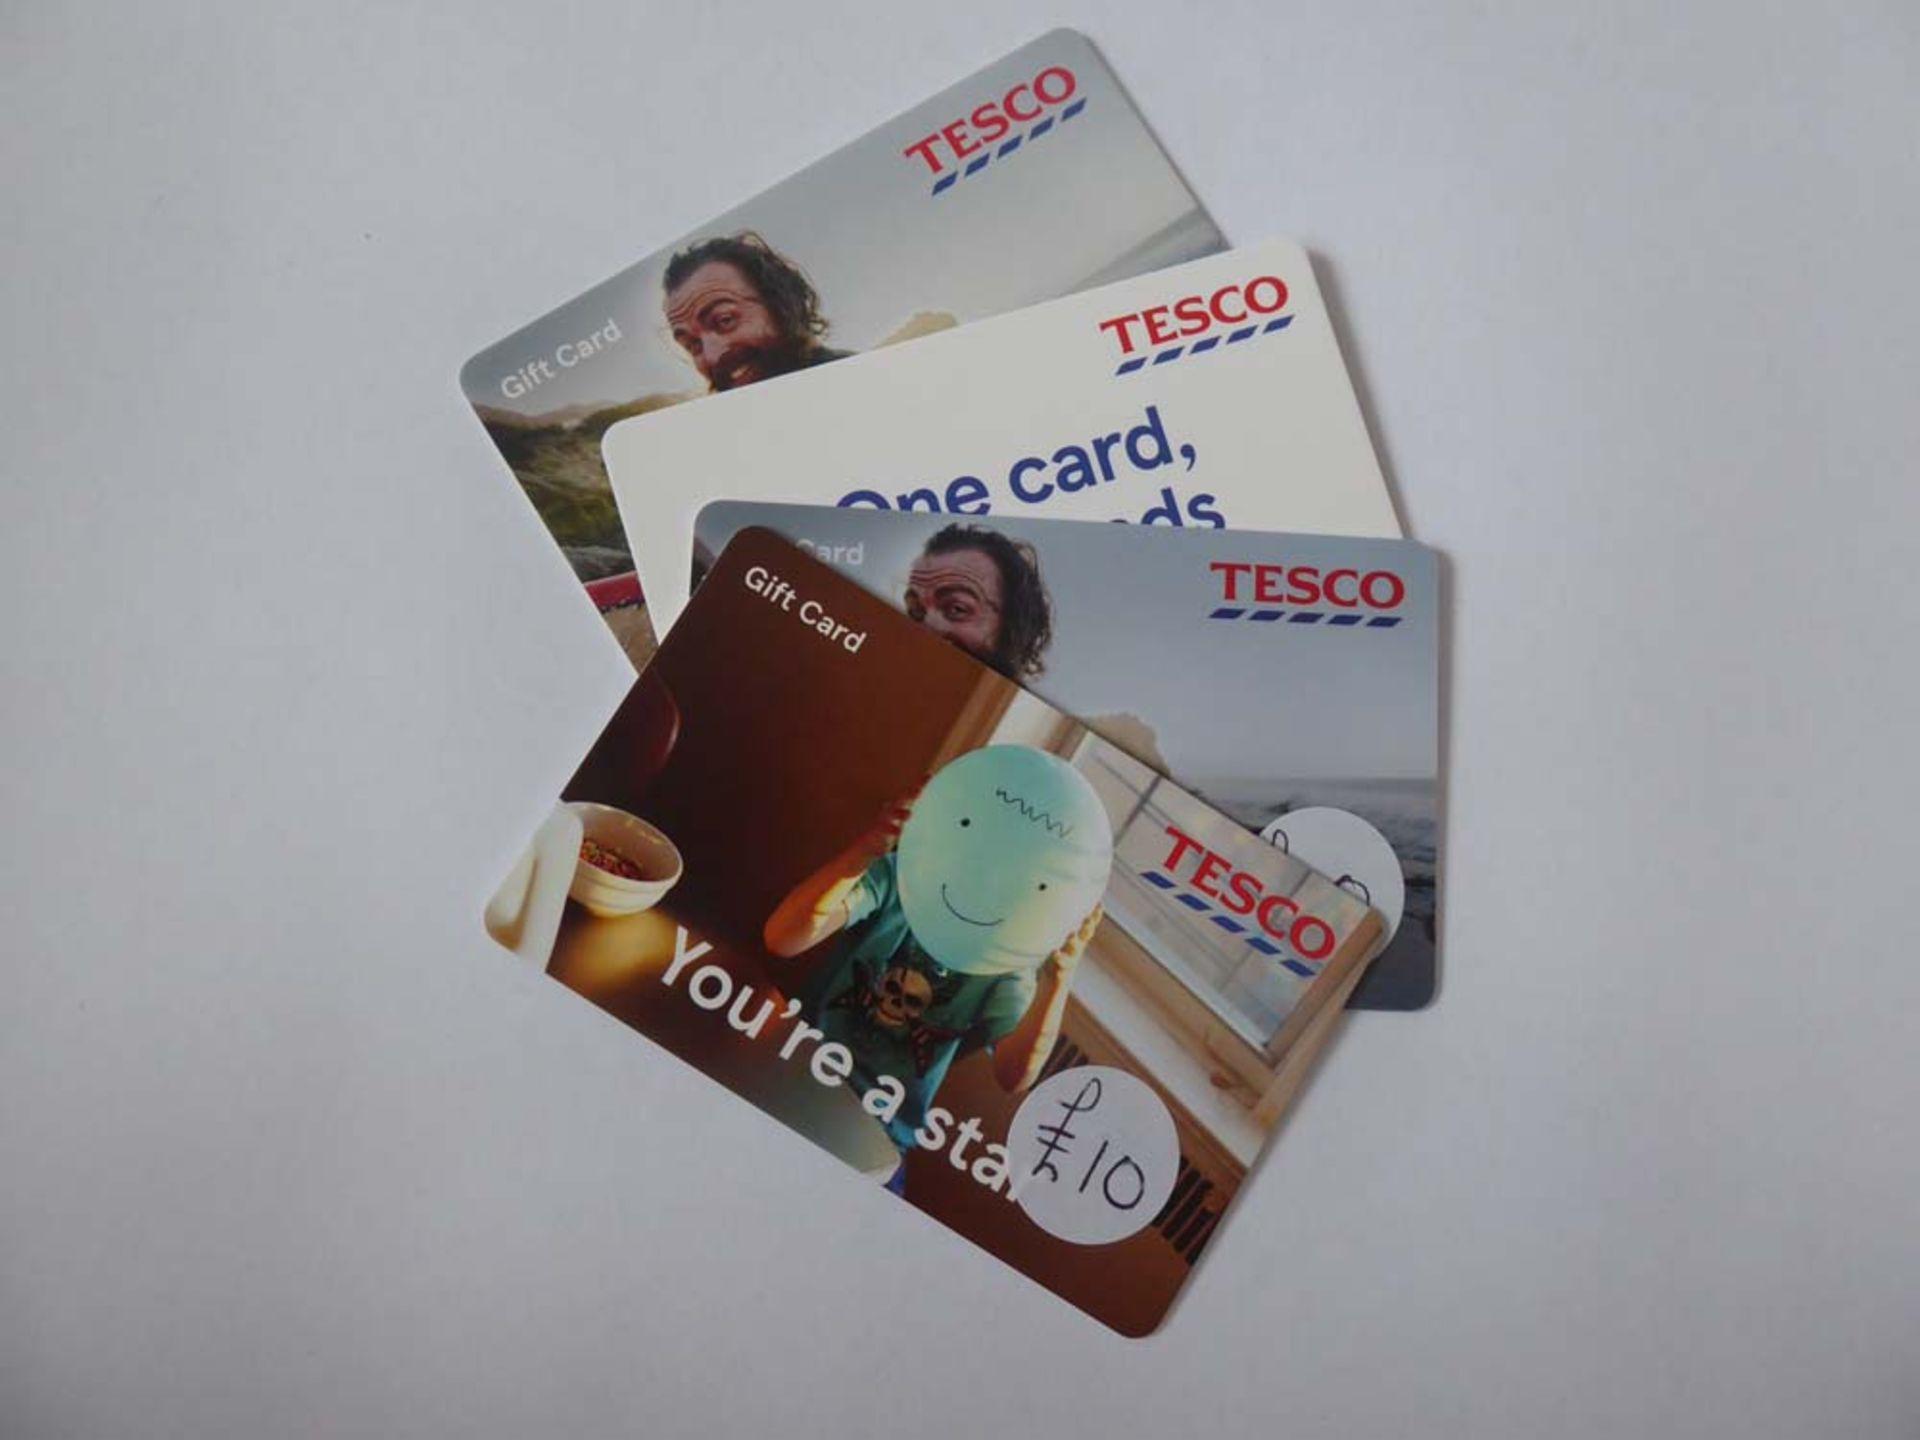 Tesco (x4) - Total face value £105